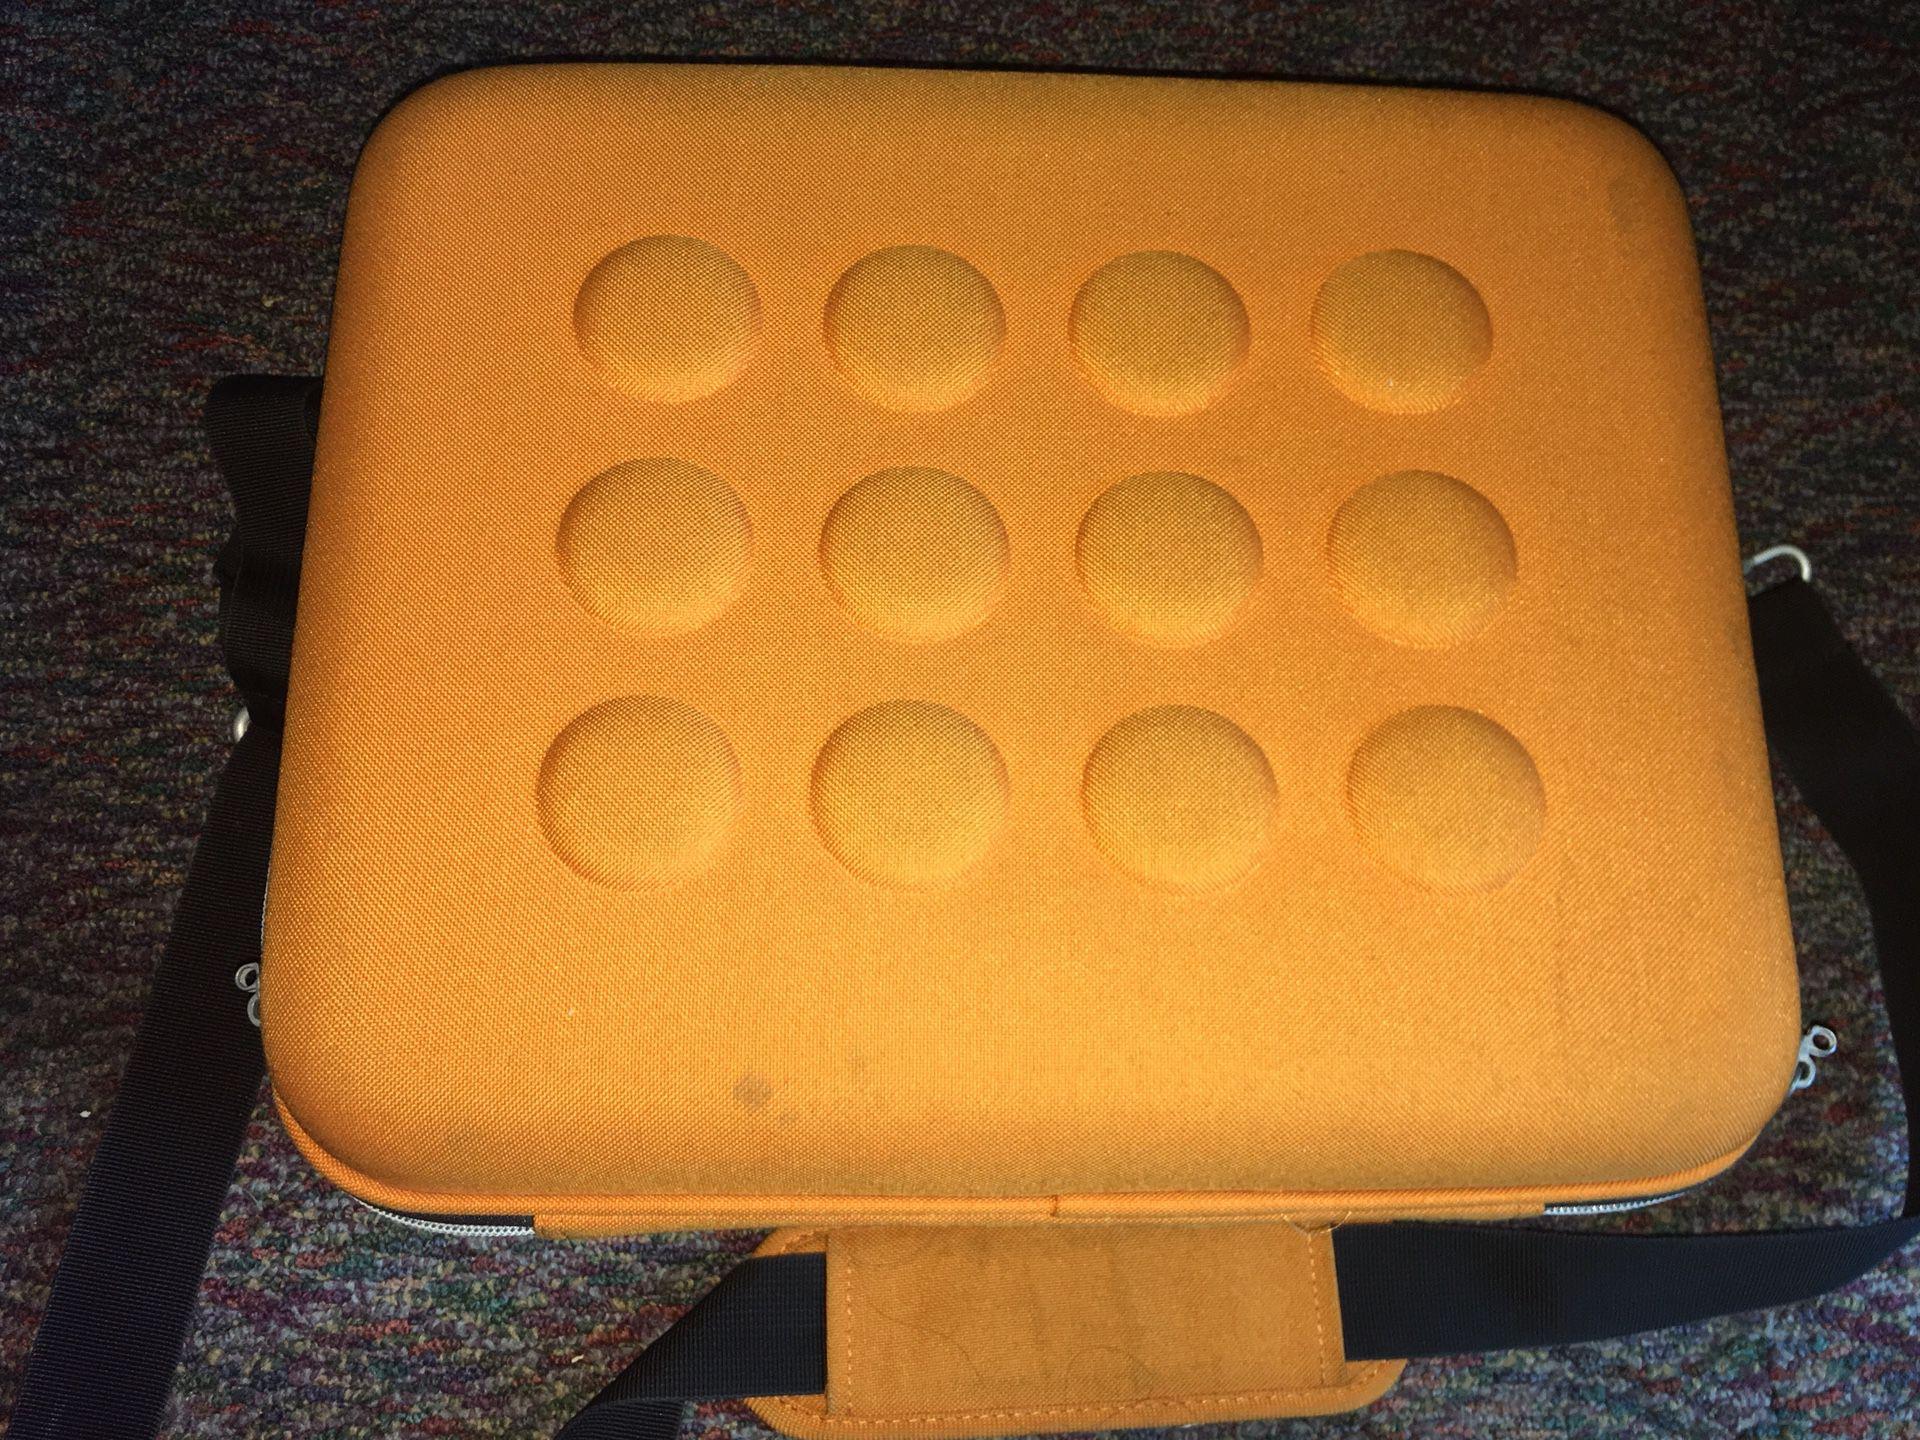 Rugged Orange Laptop Case